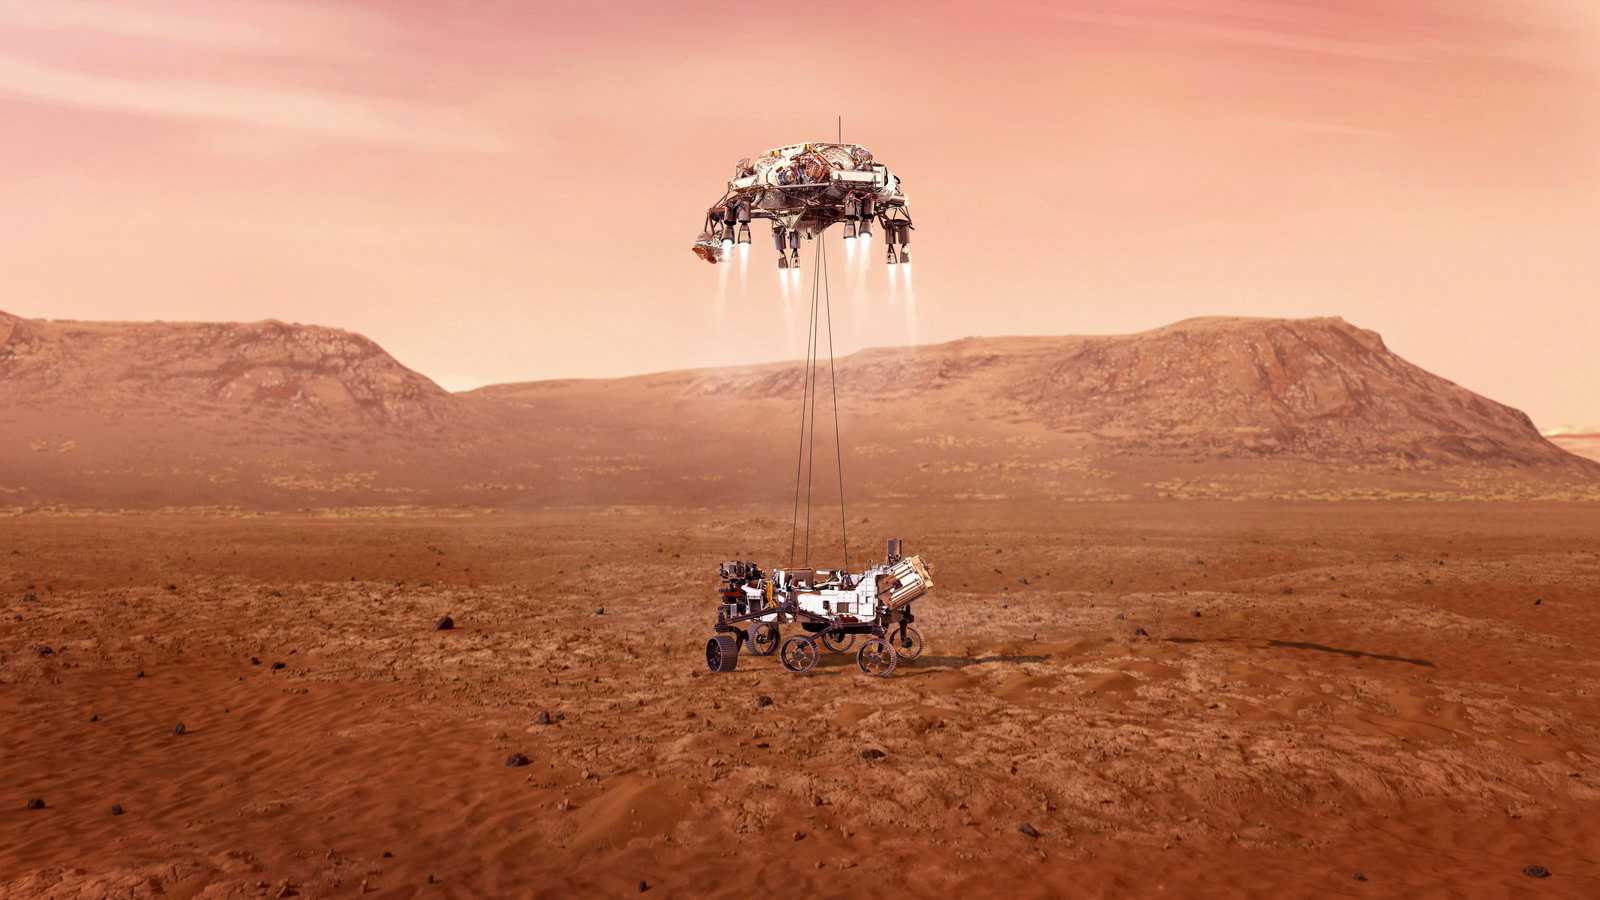 NASA: Το Perseverance προσεδαφίστηκε στον Άρη – Οι πρώτες εικόνες και τα «7 λεπτά τρόμου» (pics, vids)